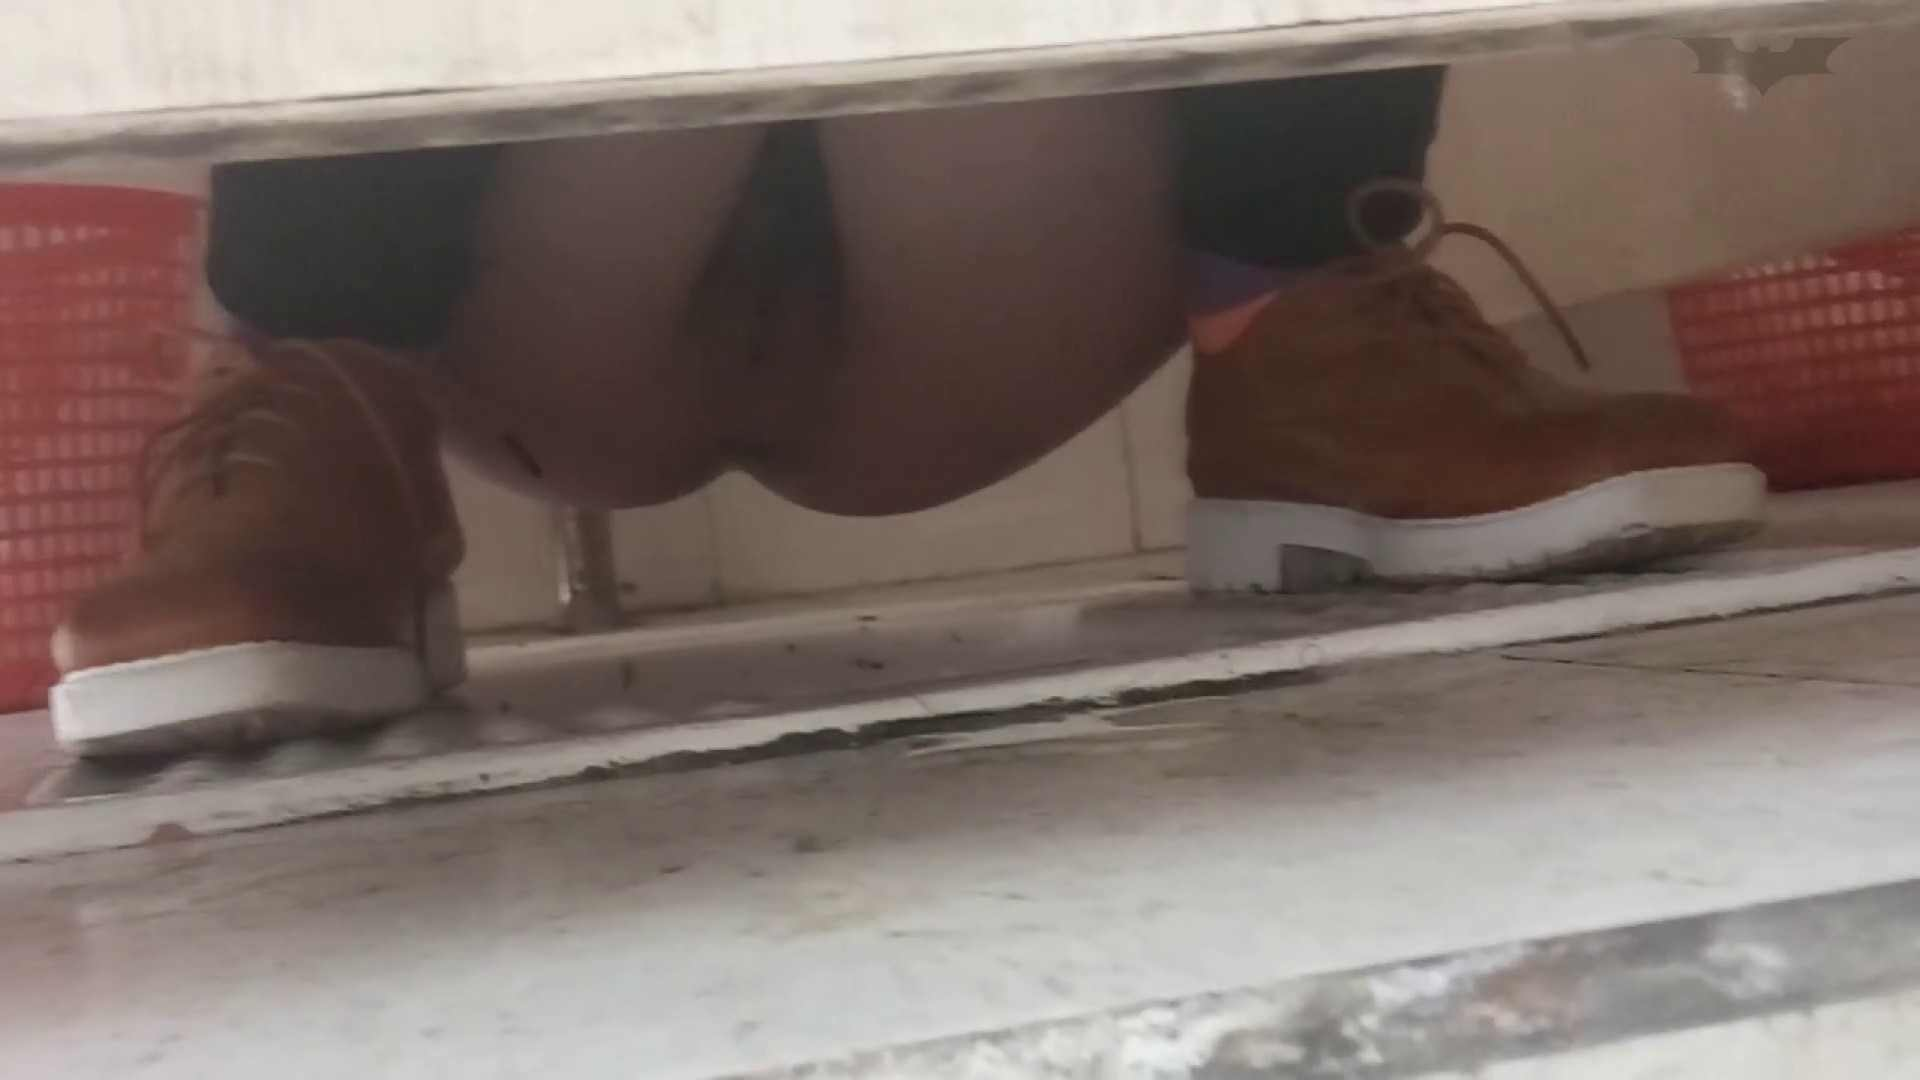 JD盗撮 美女の洗面所の秘密 Vol.49 細身女性 オメコ無修正動画無料 62画像 4